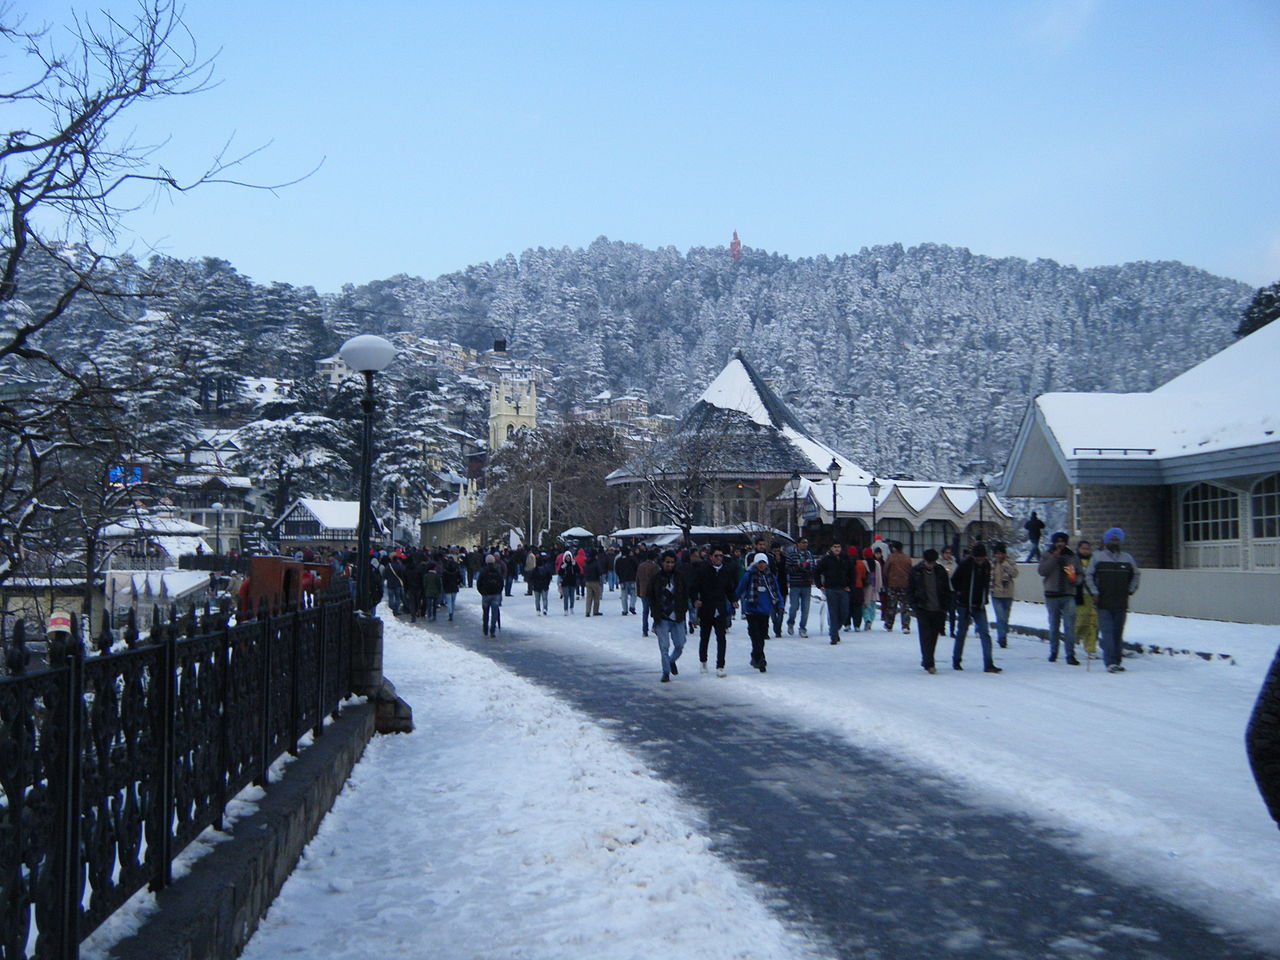 Romantic Holiday Destinations in India - Shimla, Himachal Pradesh